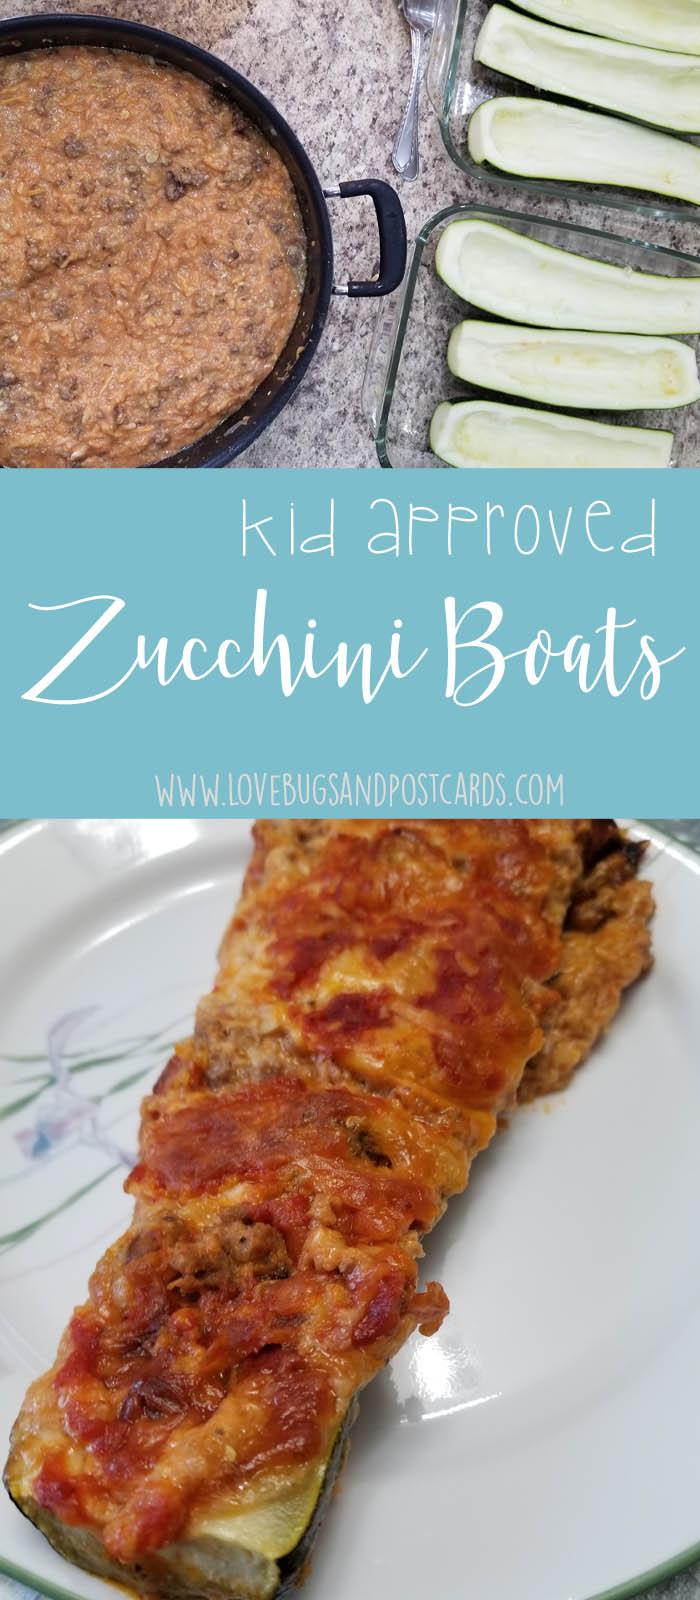 kid approved Zucchini Boats recipe - Italian Style